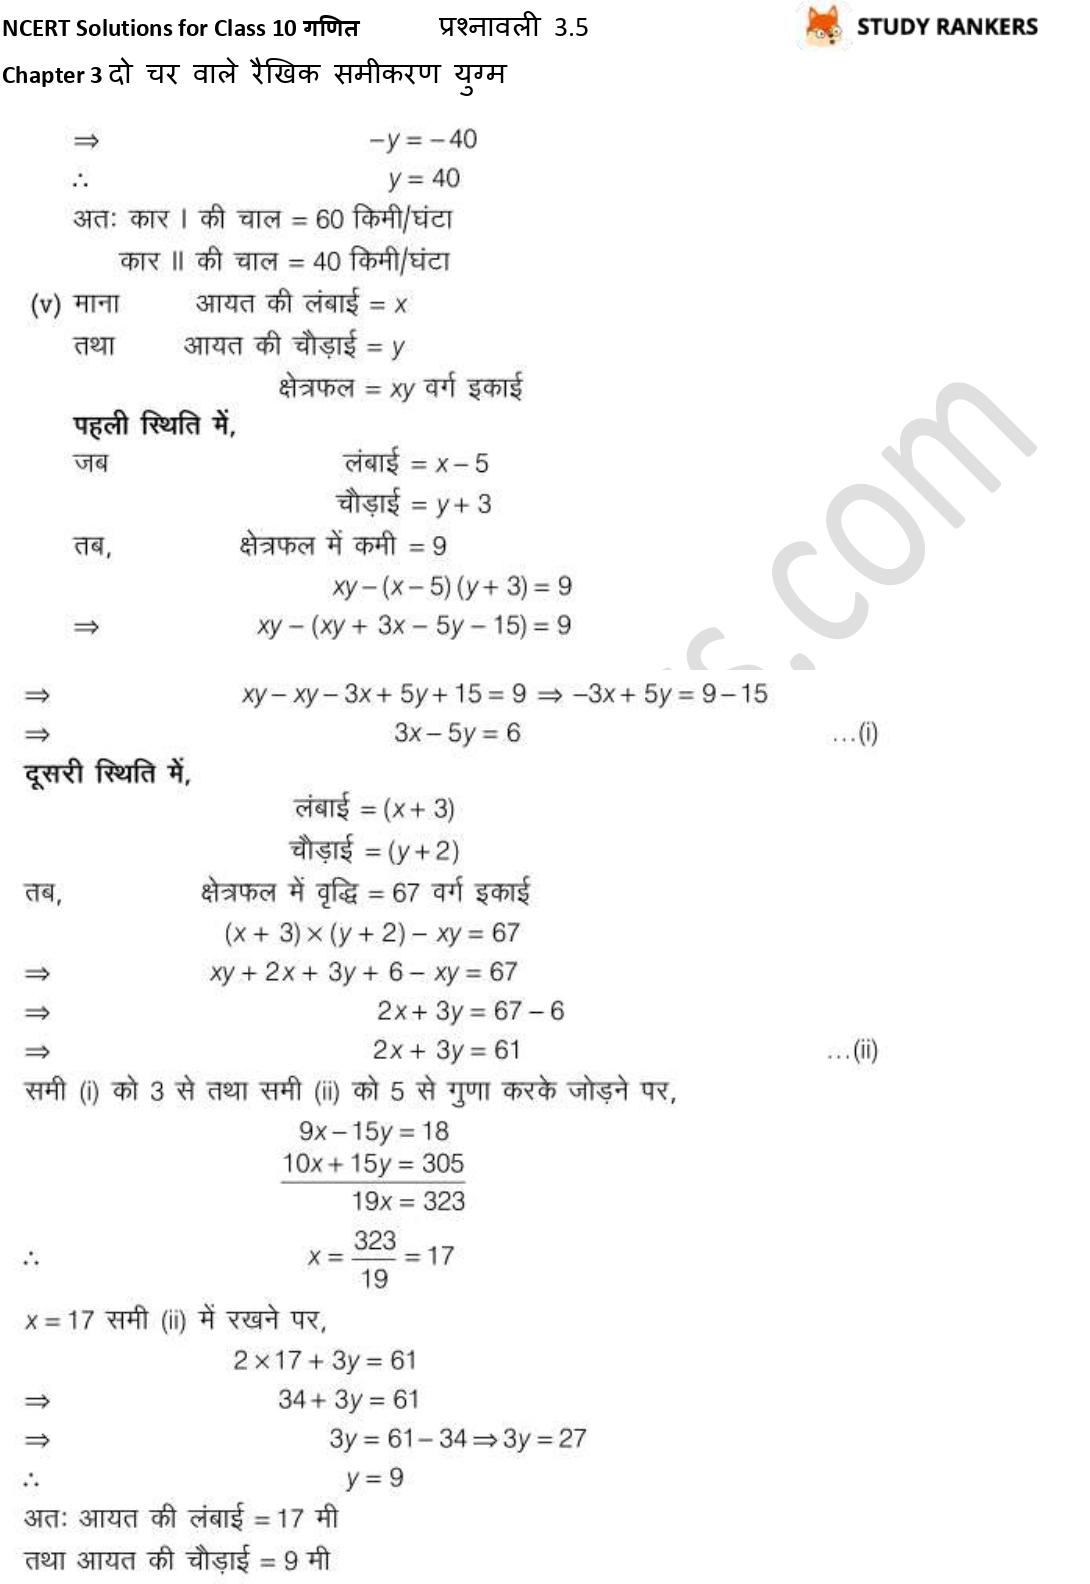 NCERT Solutions for Class 10 Maths Chapter 3 दो चर वाले रैखिक समीकरण युग्म प्रश्नावली 3.5 Part 13